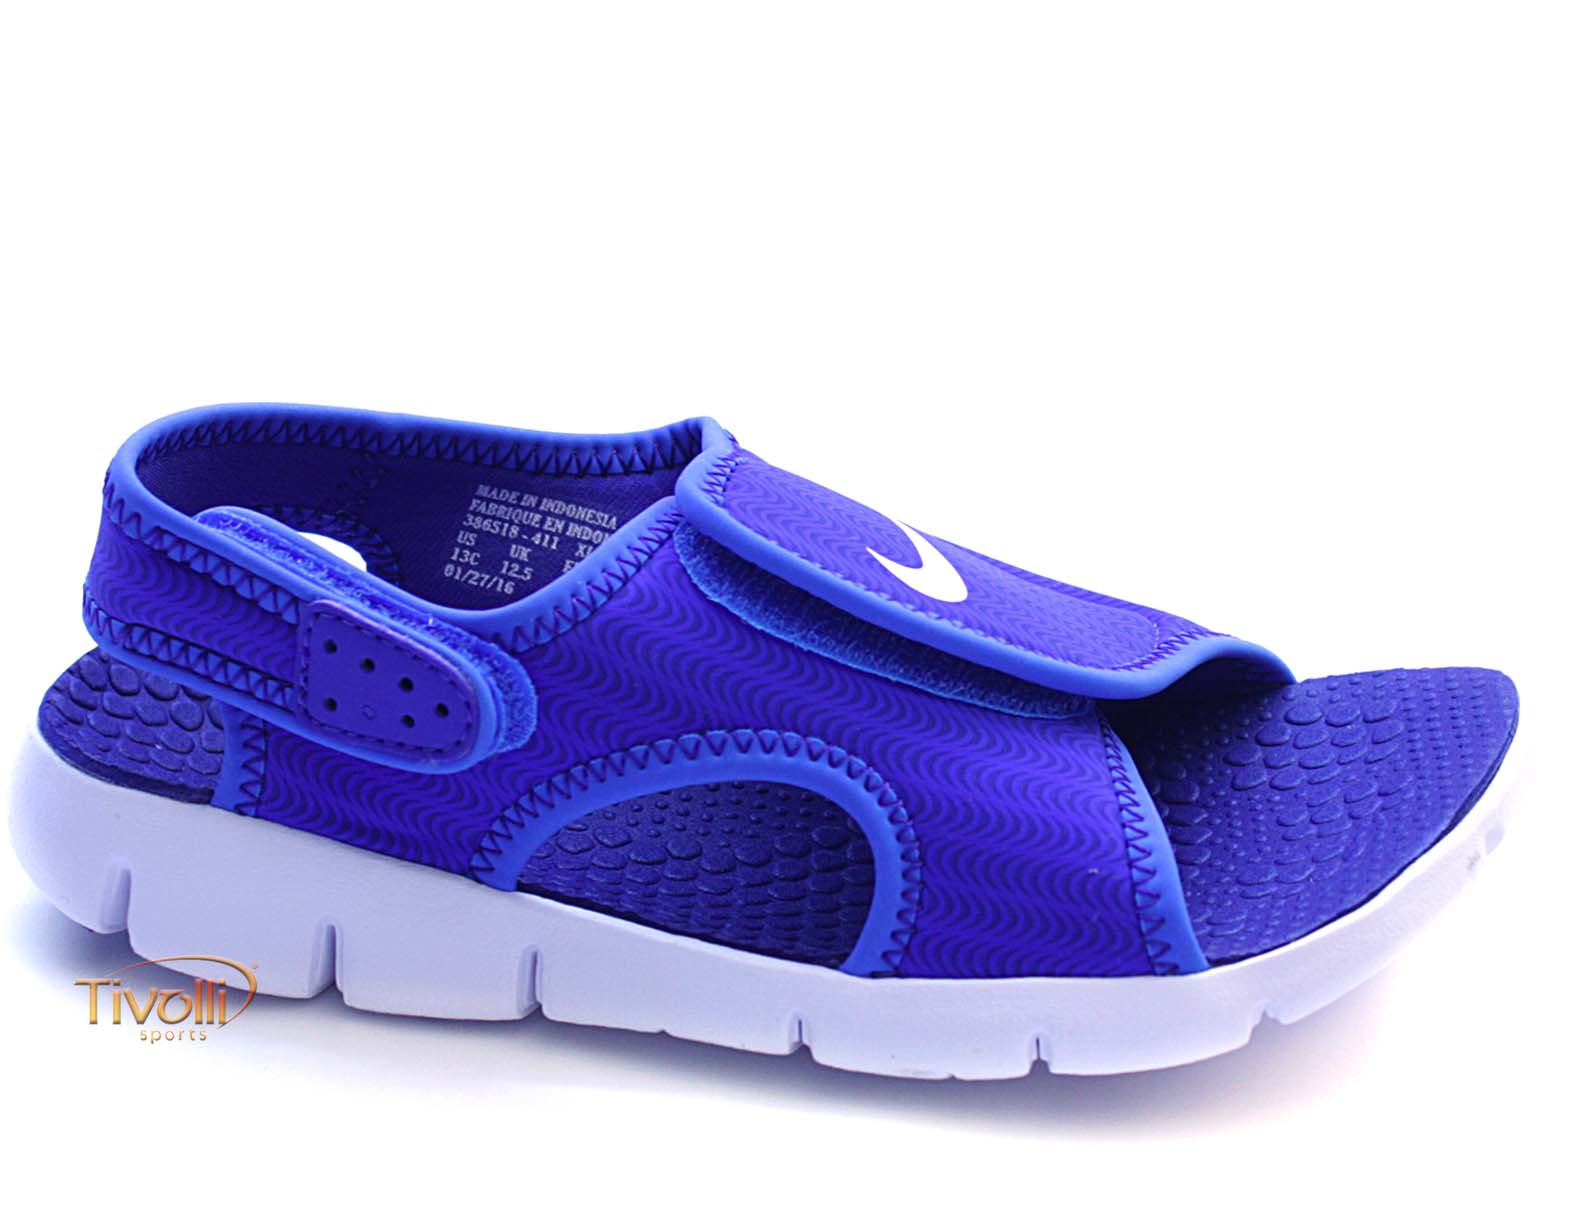 b52f310cf59 Sandália Nike Sunray Adjust 4 (TD) Infantil Papete Azul e Branca - Tamanho  17 ao 26